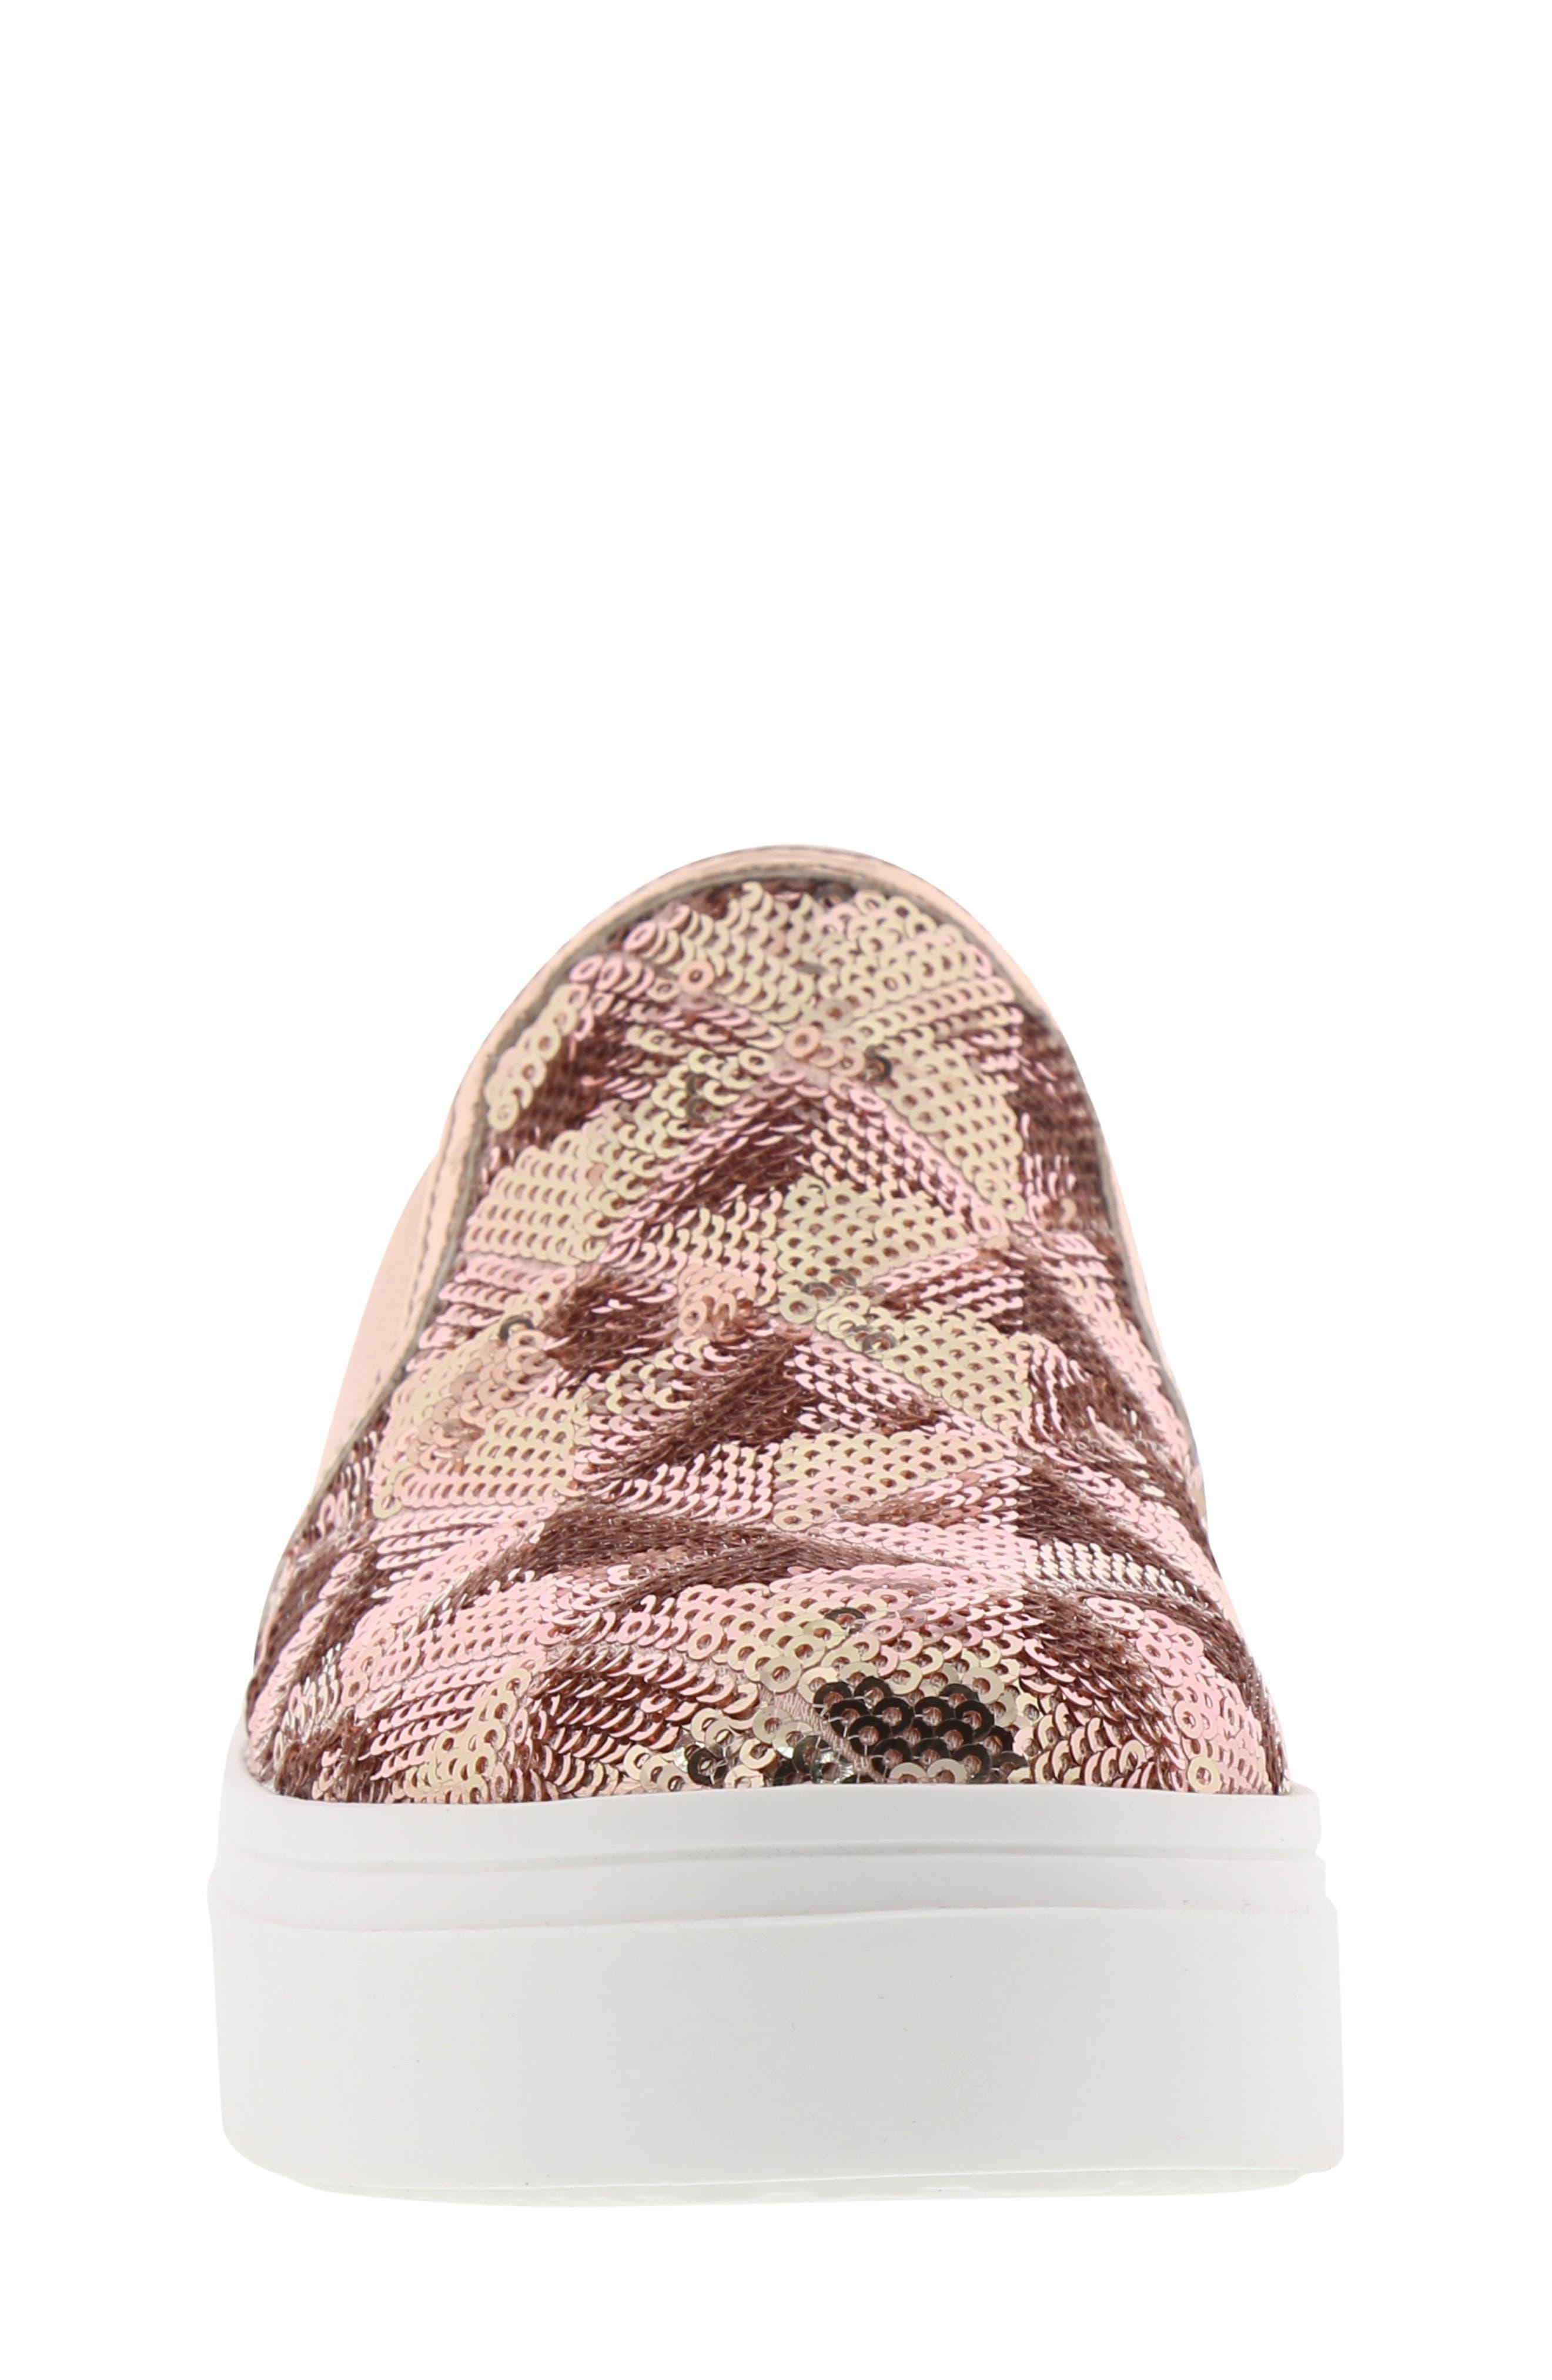 Sheena Pam Sequin Sneaker,                             Alternate thumbnail 4, color,                             ROSE GOLD